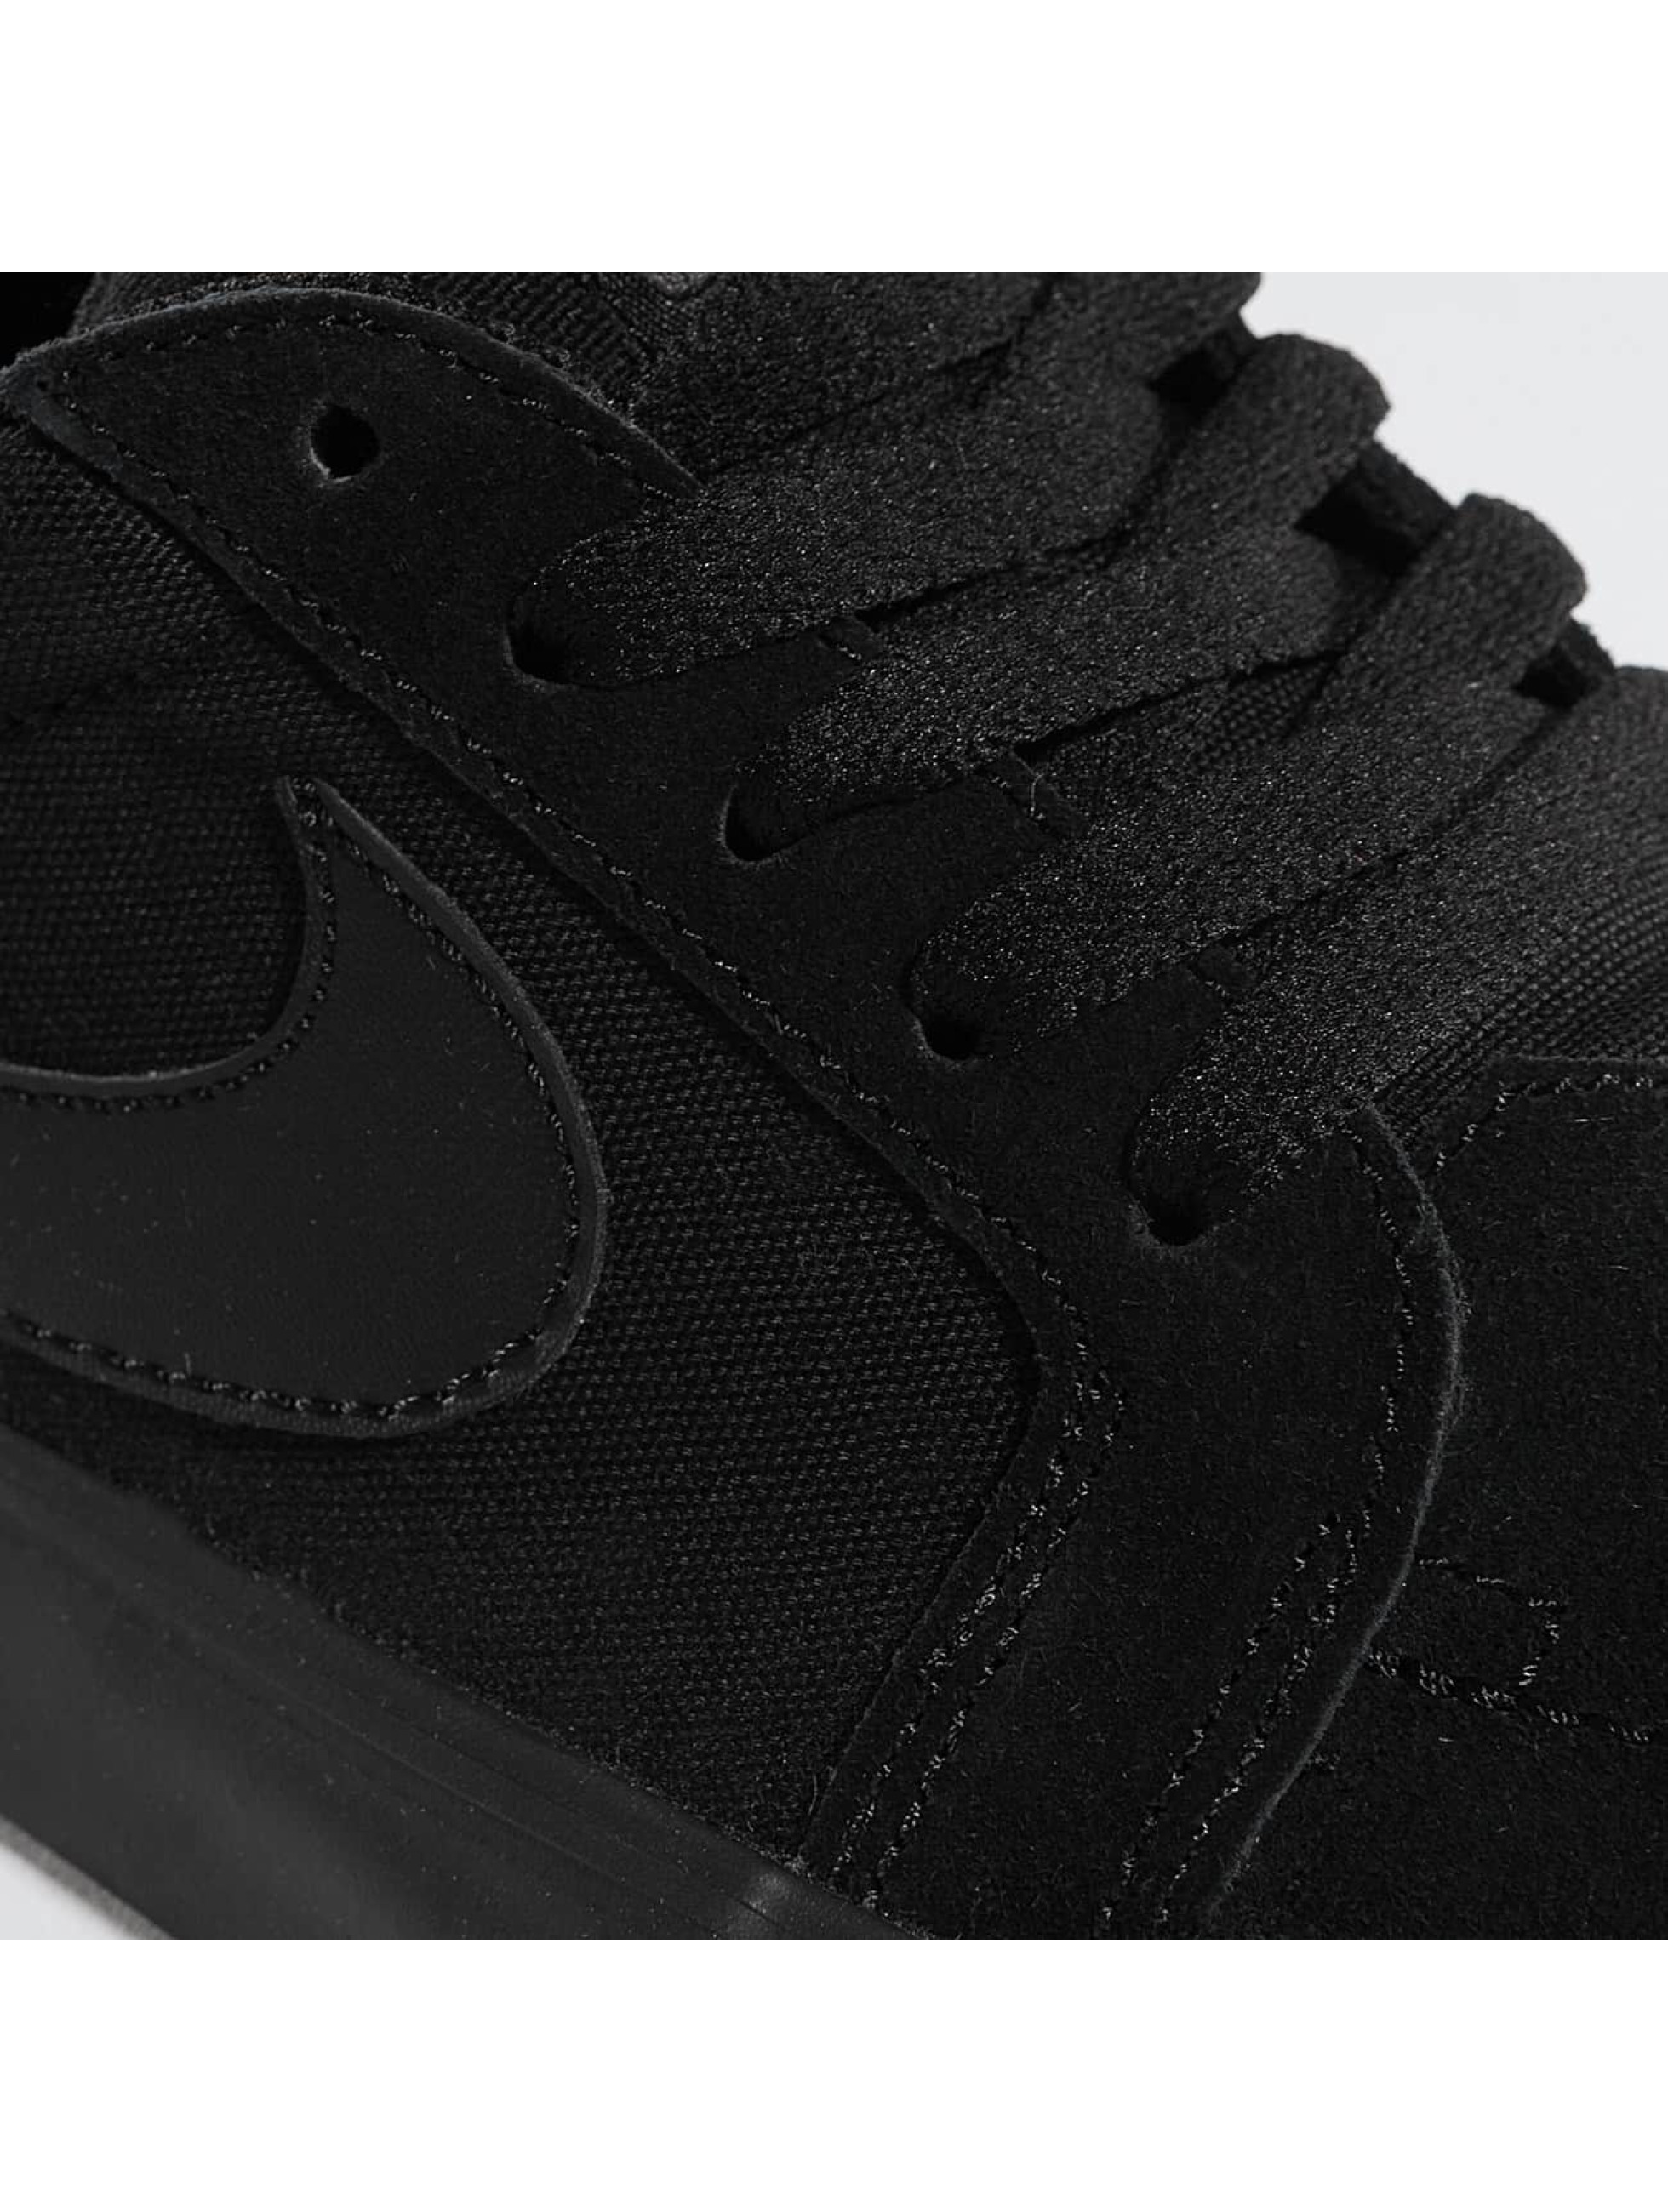 Nike SB Zapatillas de deporte SB Satire II negro